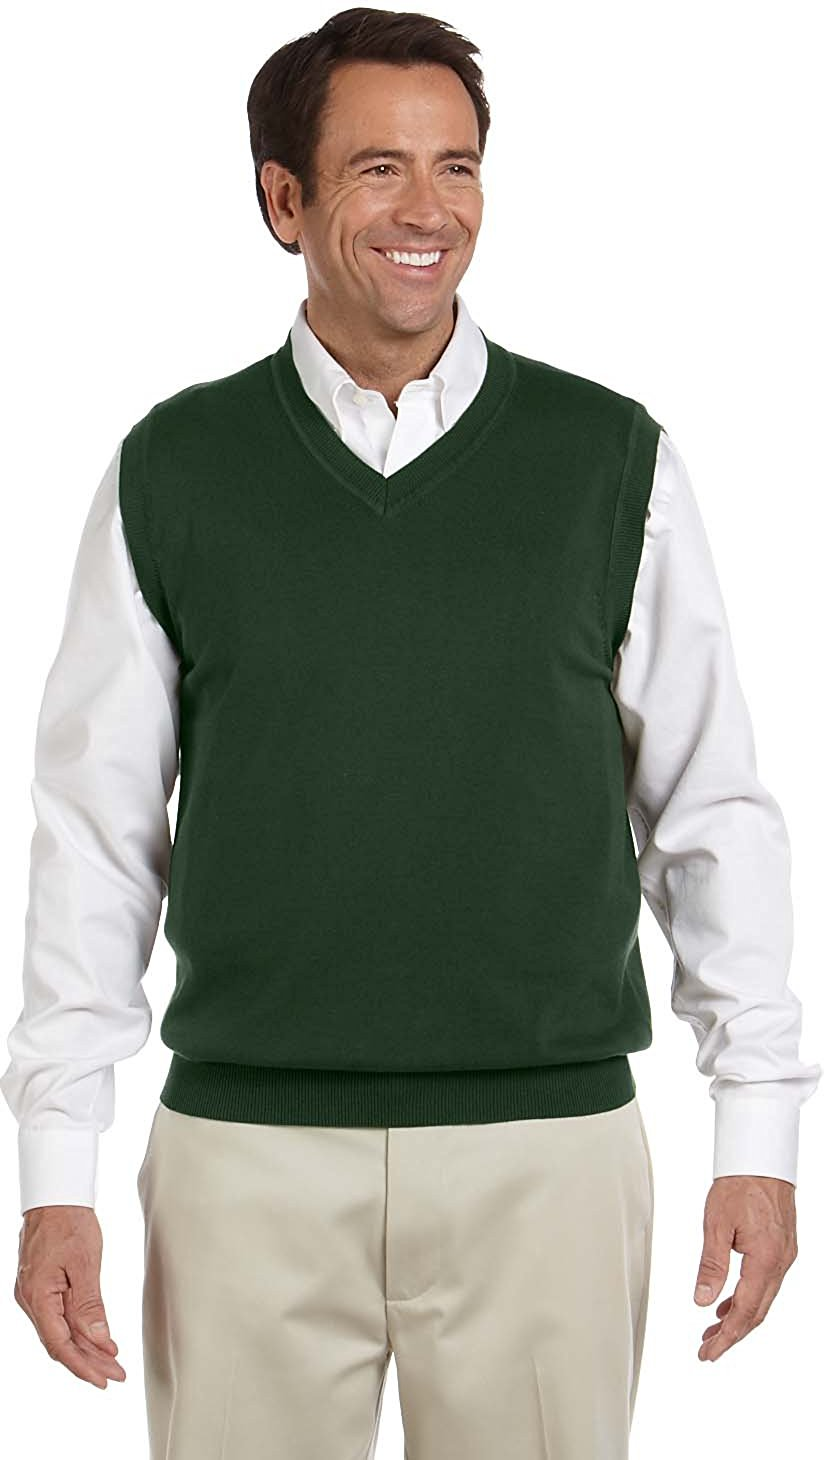 vest for men devon u0026 jones menu0027s v-neck sweater vest at amazon menu0027s clothing store: phmtnuy